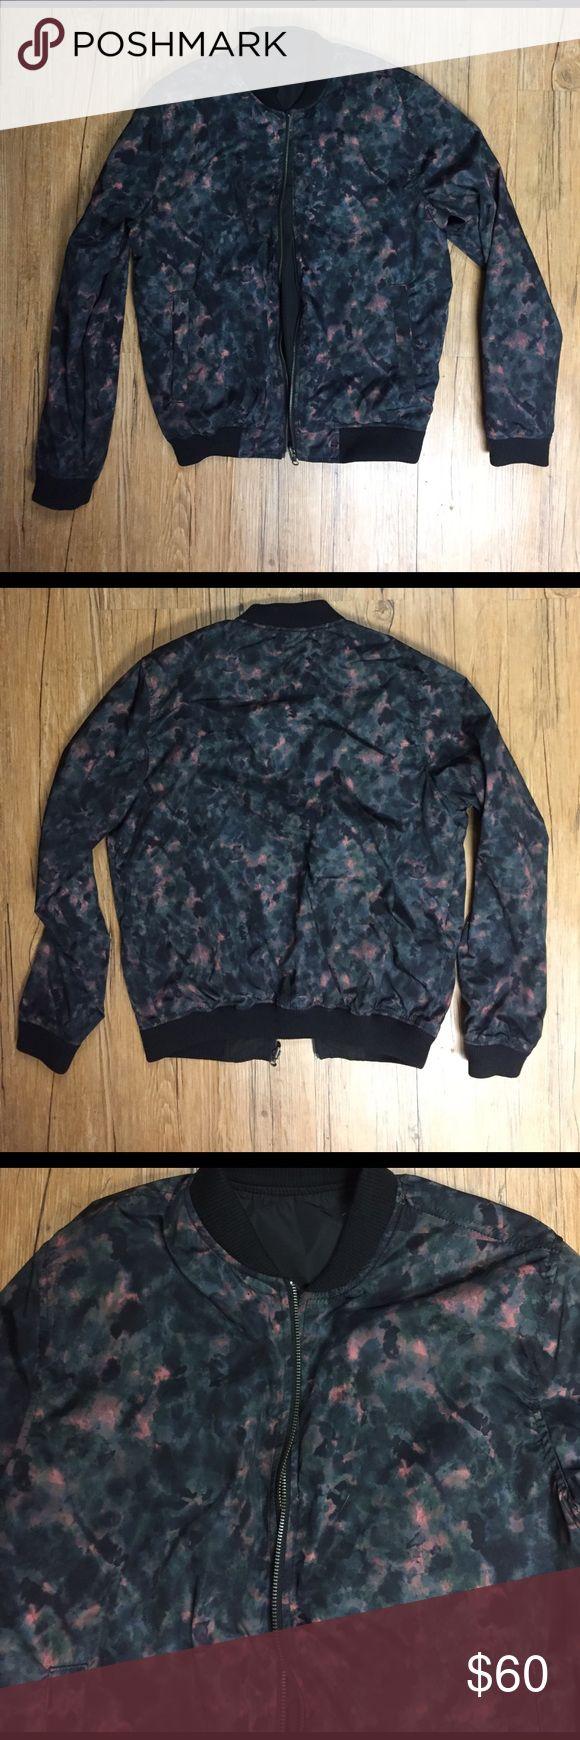 Unisex Topman reversible bomber jacket Reversible pink black green combo side and all black alternate, zip up jacket, great condition, Size Medium, 100% polyester, Topman Jackets & Coats Bomber & Varsity